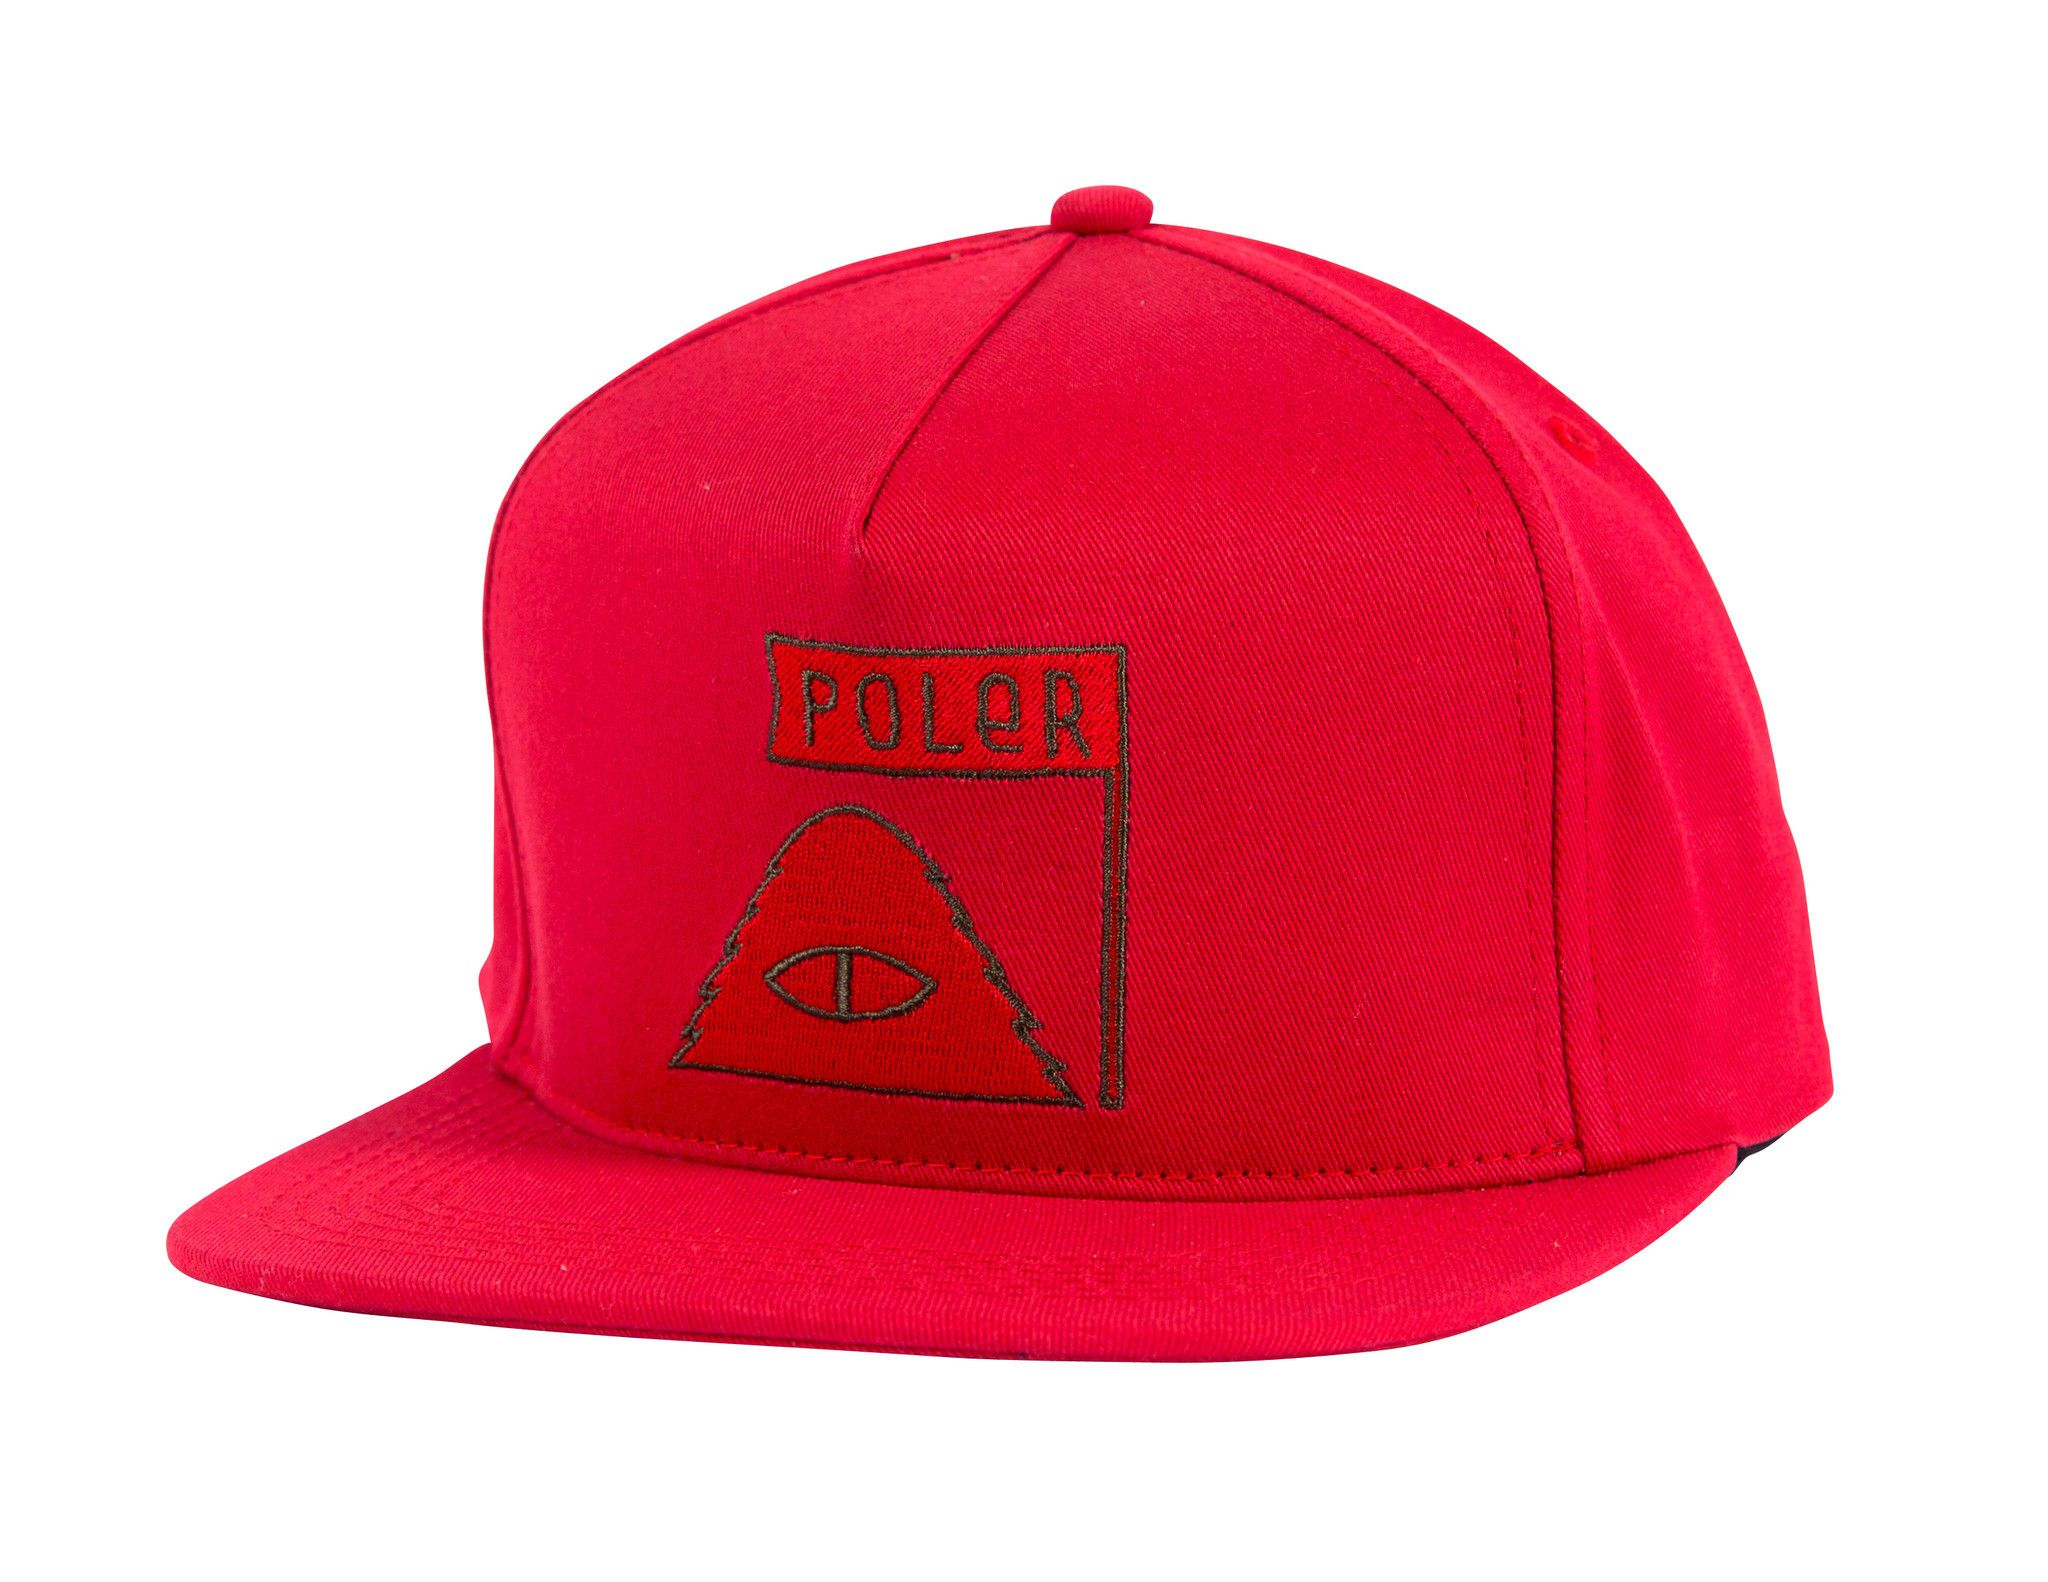 2137f951 SUMMIT SNAPBACK - RED SPRING '16 #poler #polerstuff #campvibes ...